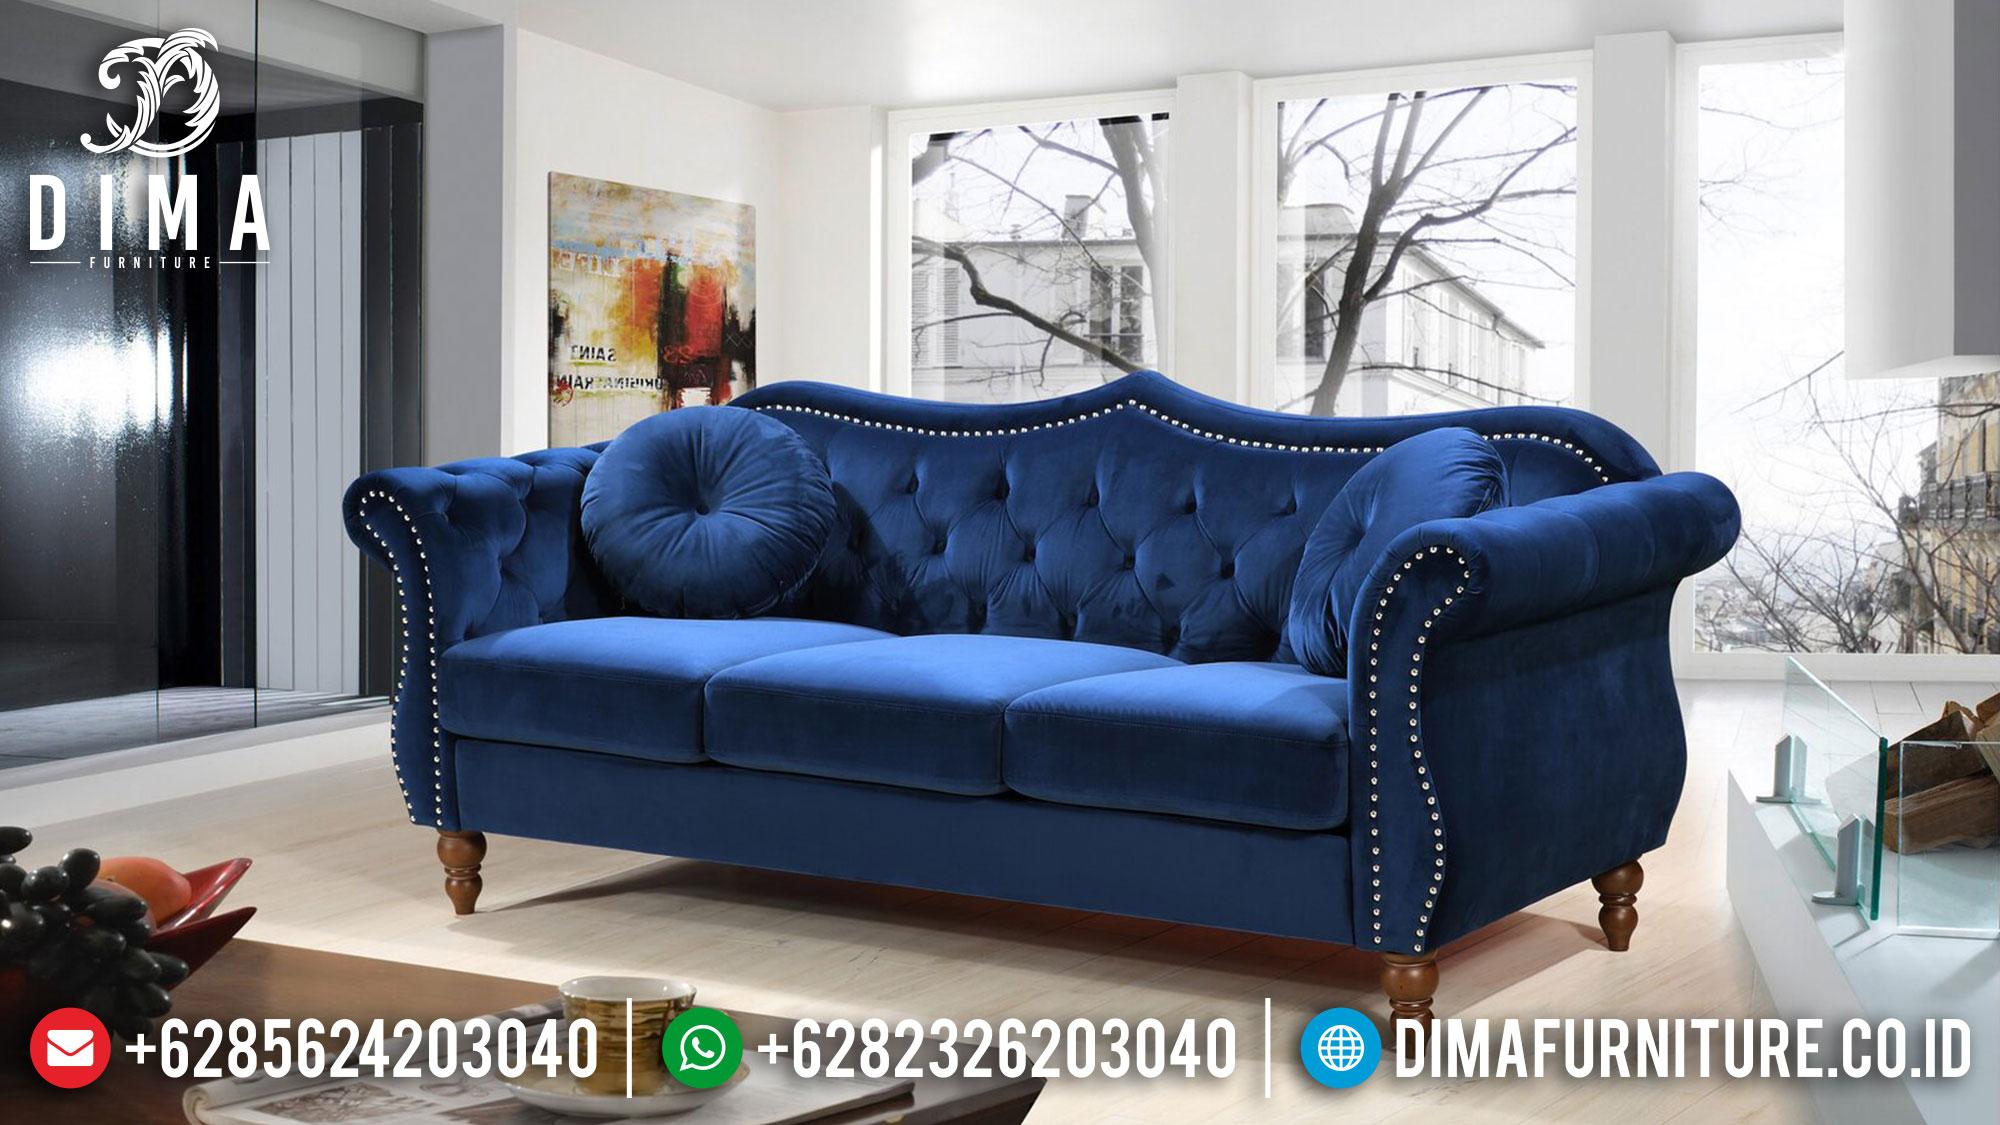 Sofa Tamu Minimalis 3 Dudukan Elegant Classic Luxury Jepara ST-1305